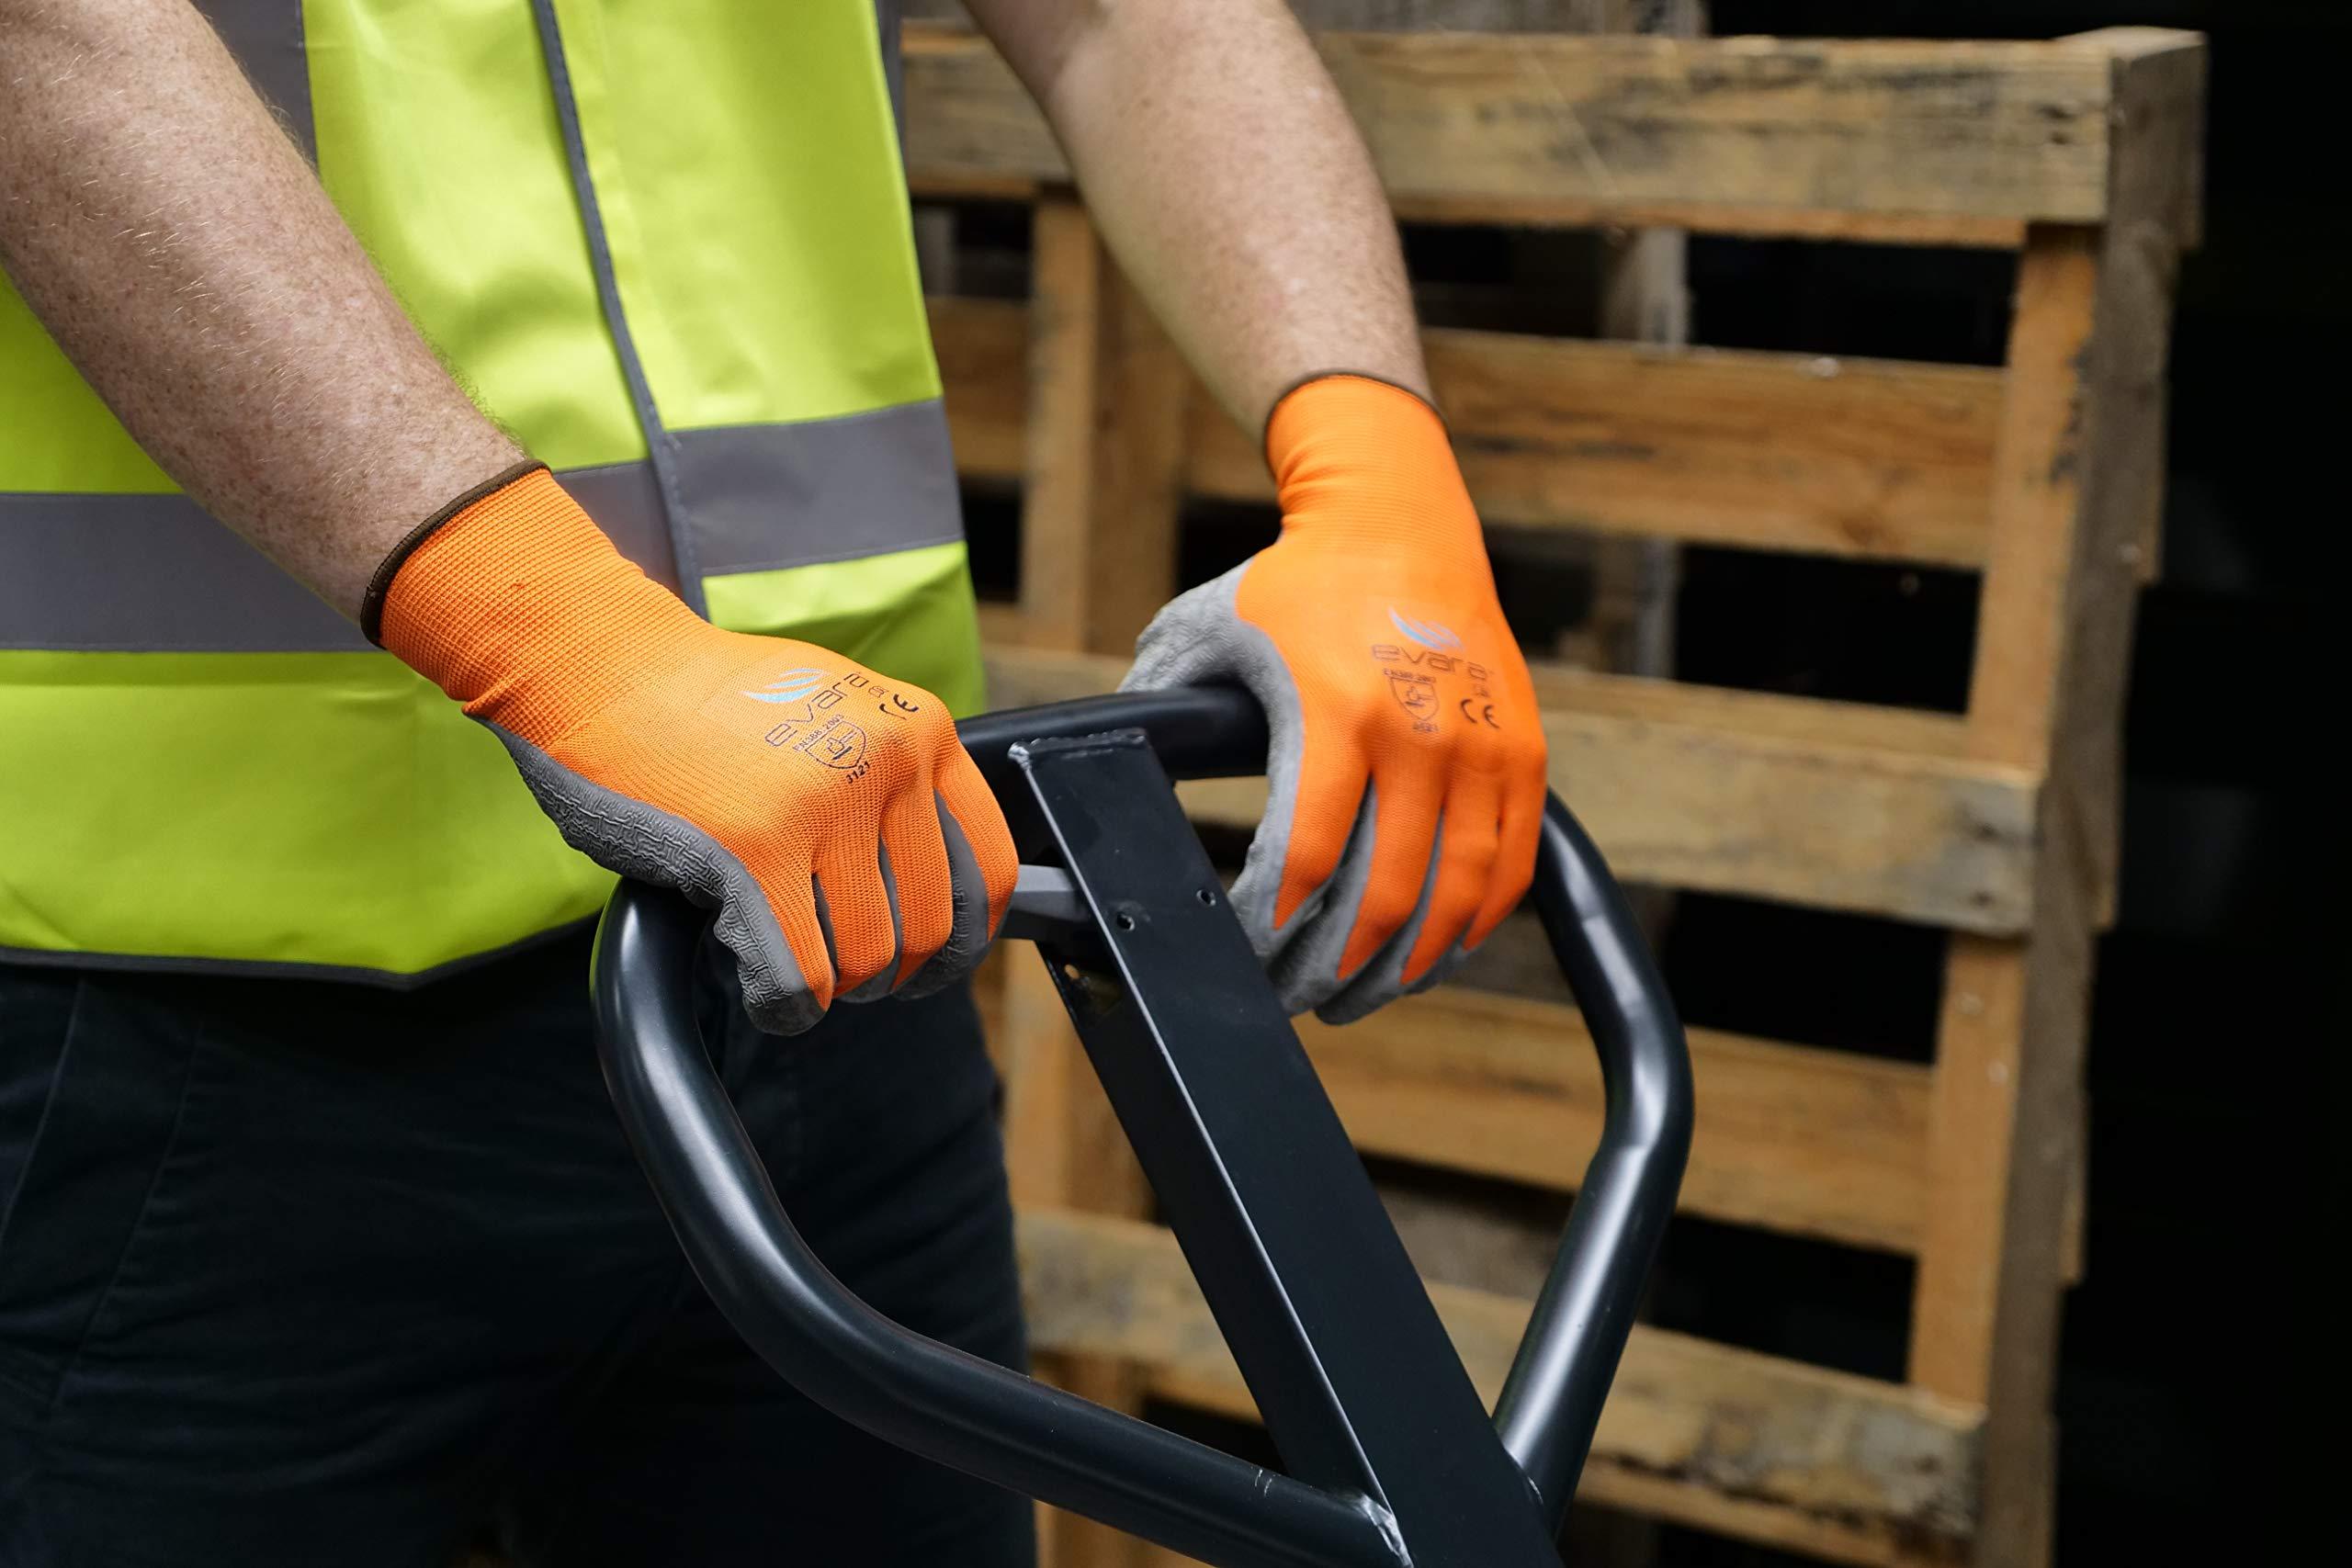 Tough Work and Gardening Gloves for Men and Women(12 pairs per pack) (Latex, Medium) Supreme Hi-vis orange with full thumb dipping by Evara by Evara (Image #2)